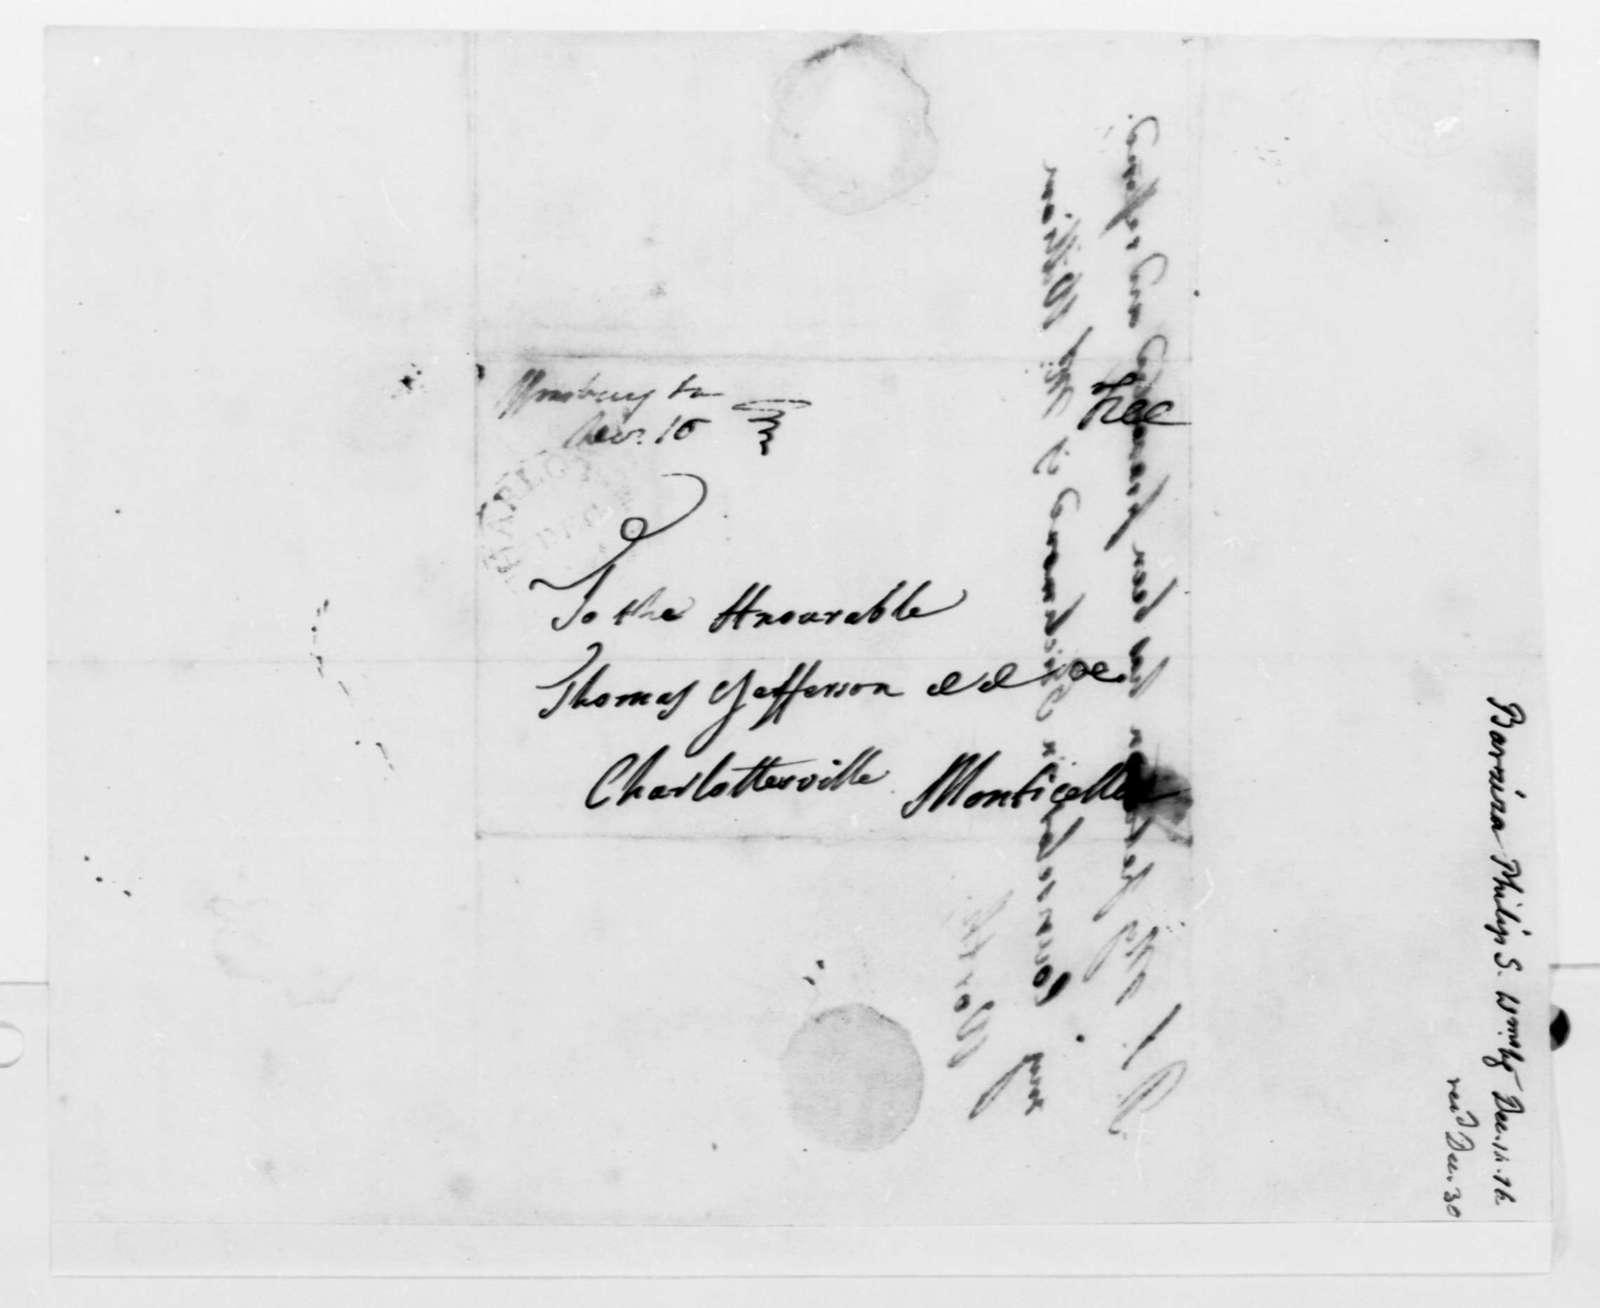 Philip Ignatius Barziza to Thomas Jefferson, December 14, 1816